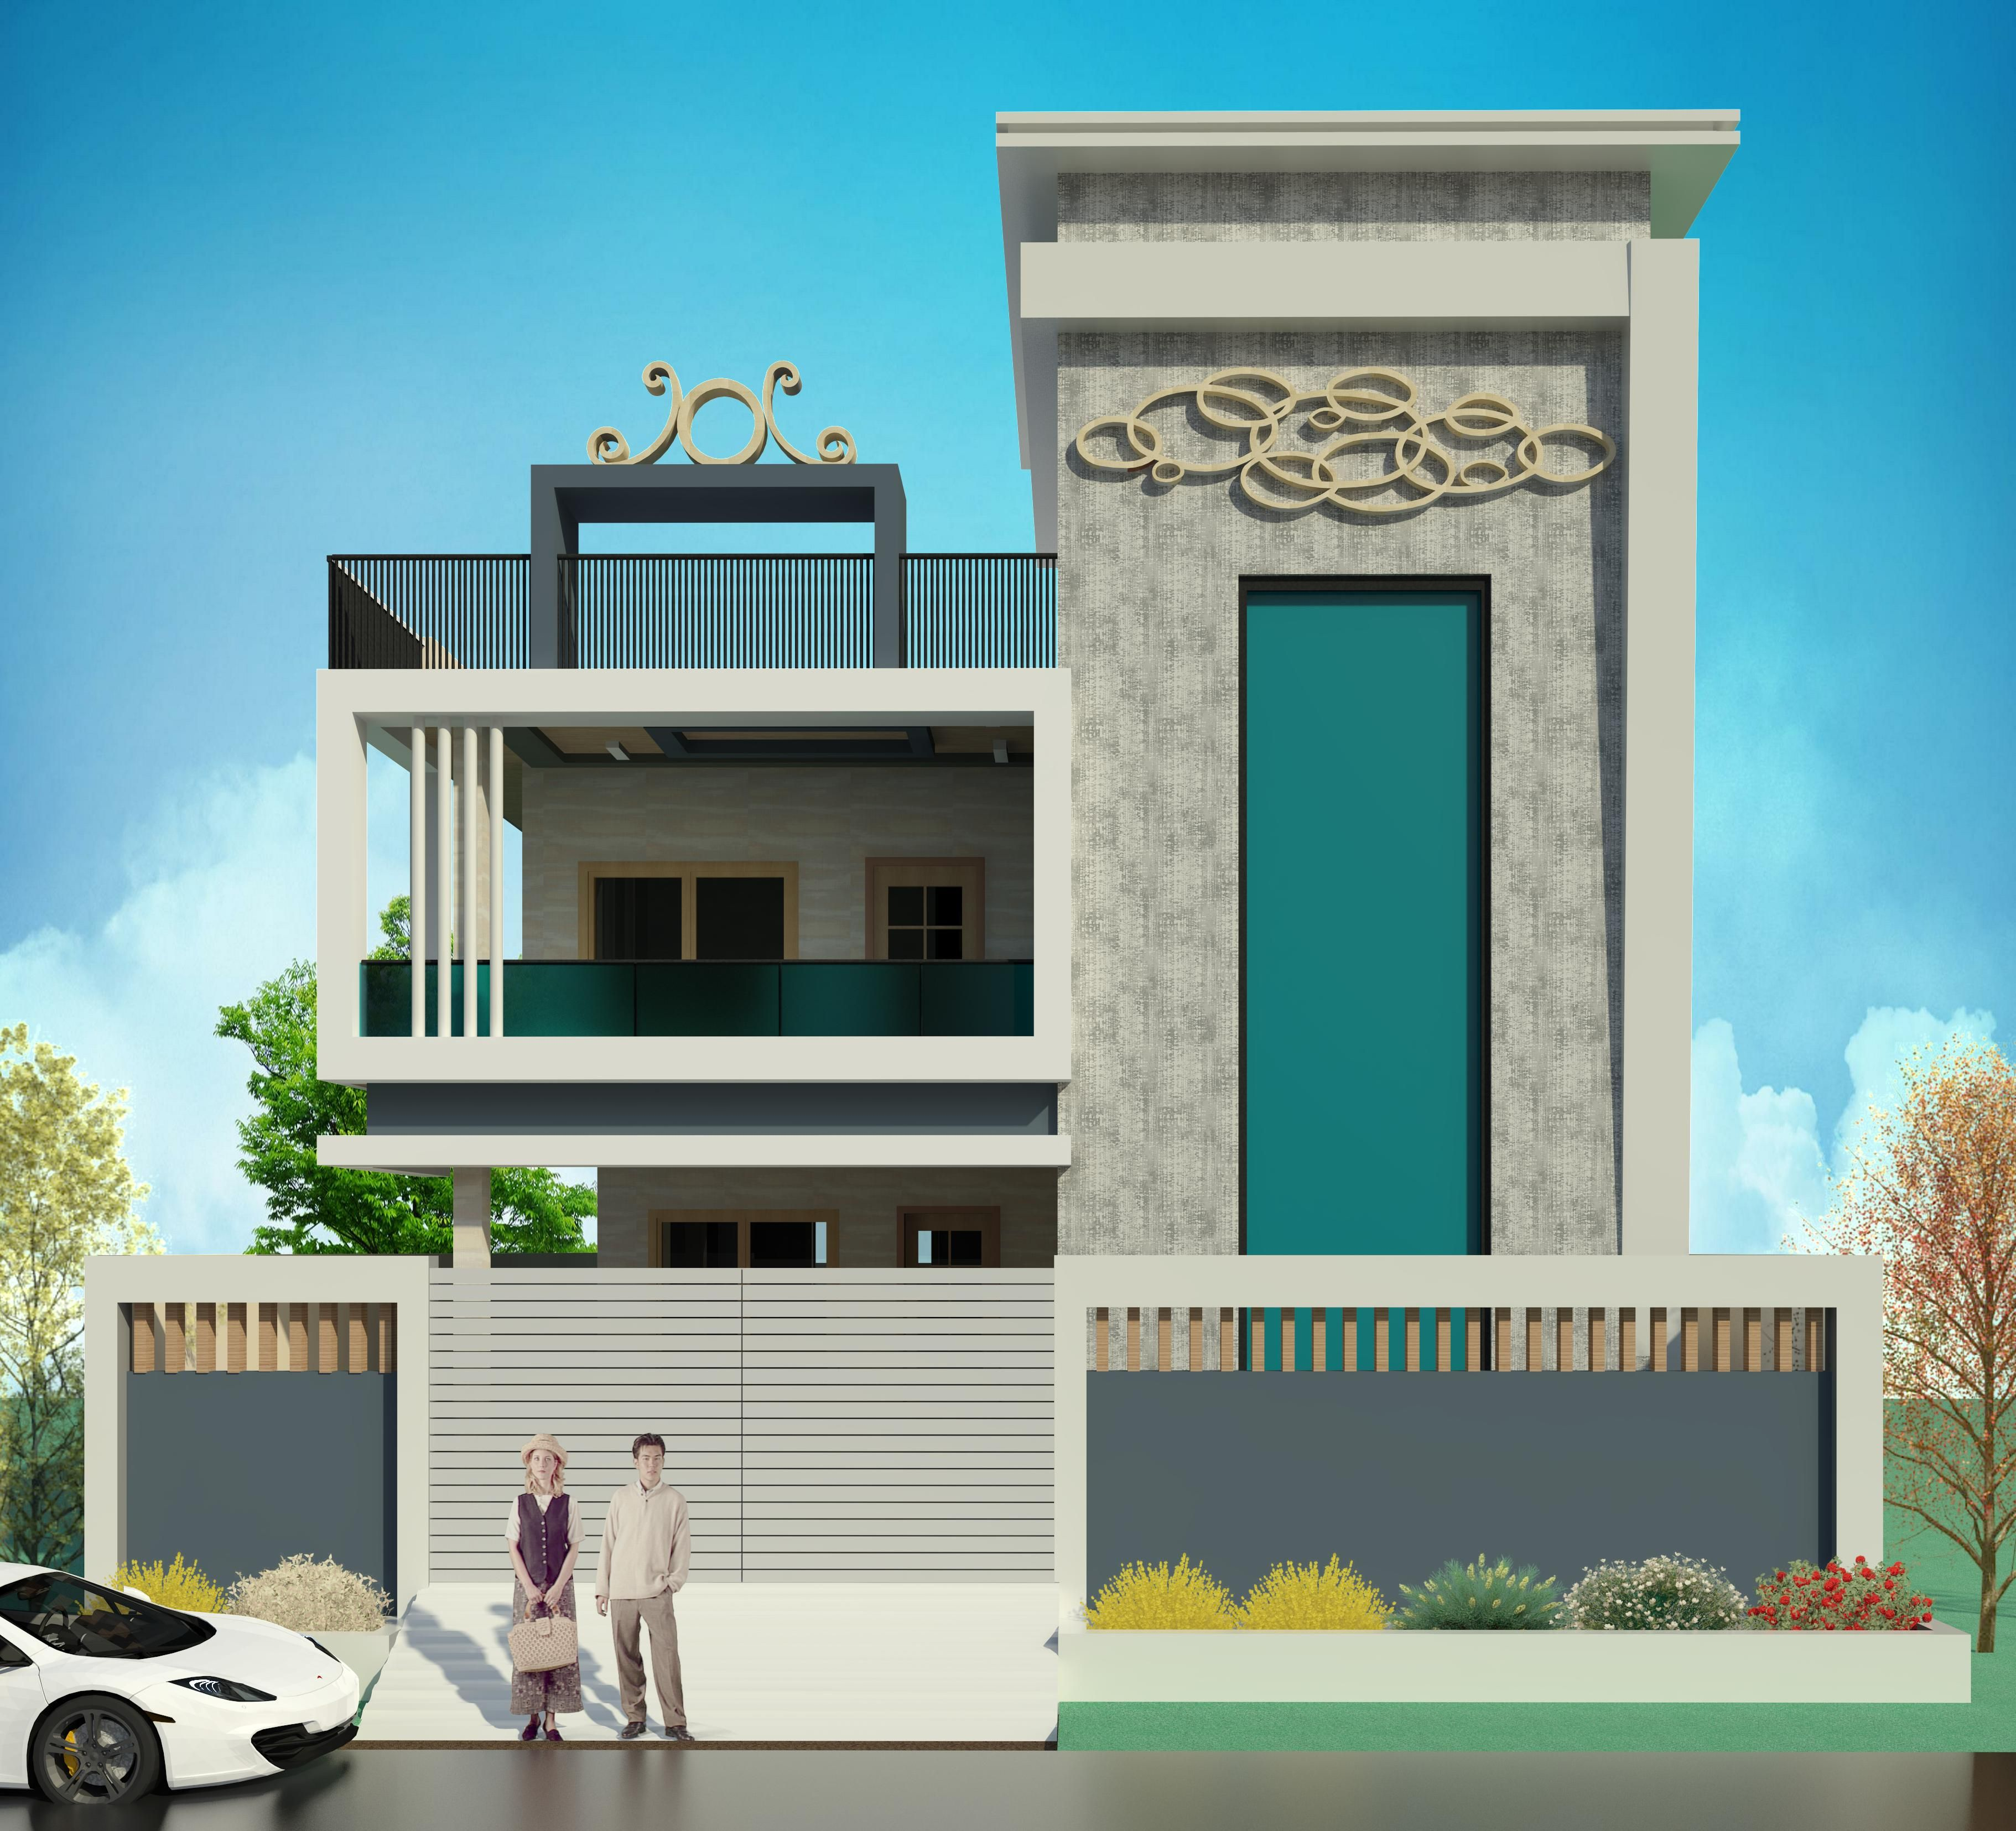 Exterior Architectural Design House House Architecture Design